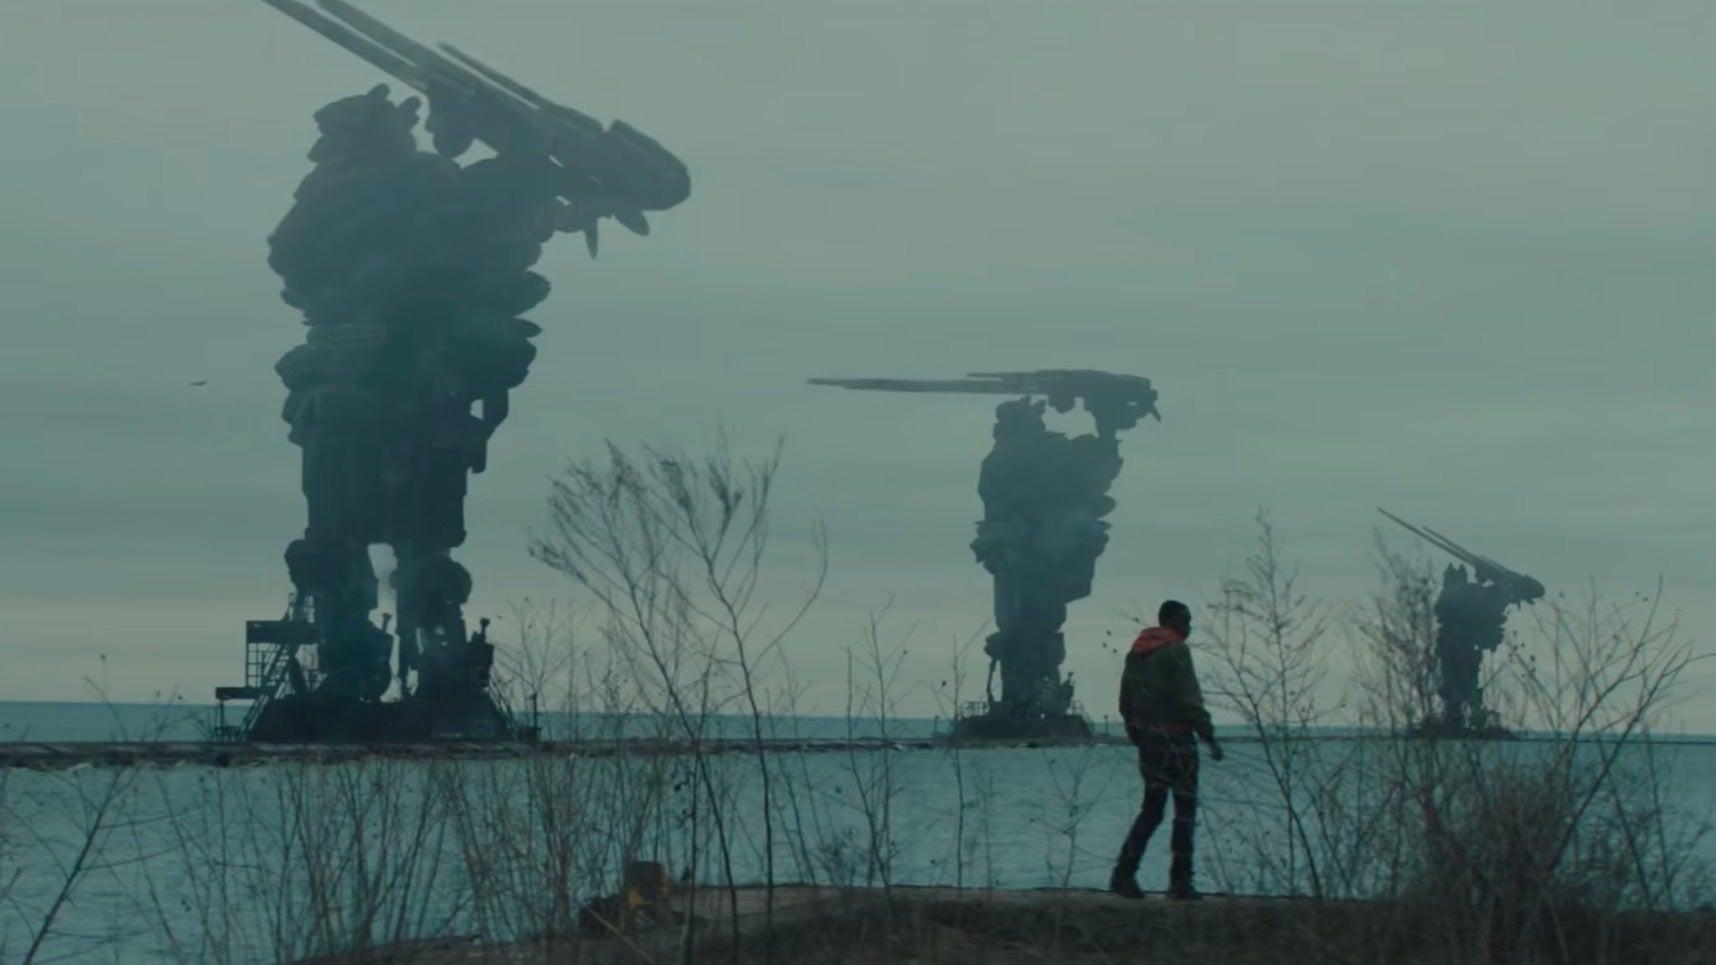 alien-invasion captive-state io9 john-goodman rupert-wyatt vera-farmiga